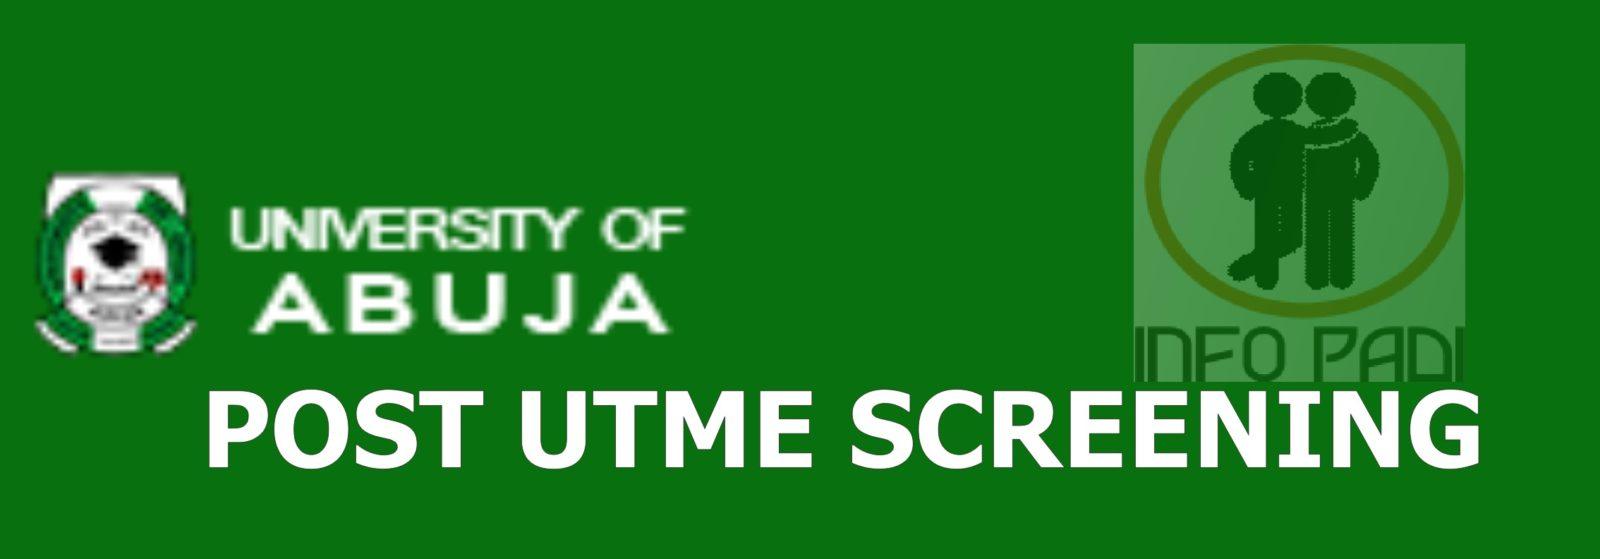 UNIVERSITY OF ABUJA (UNIABJ) Post UTME 2018/2019 Screening Form